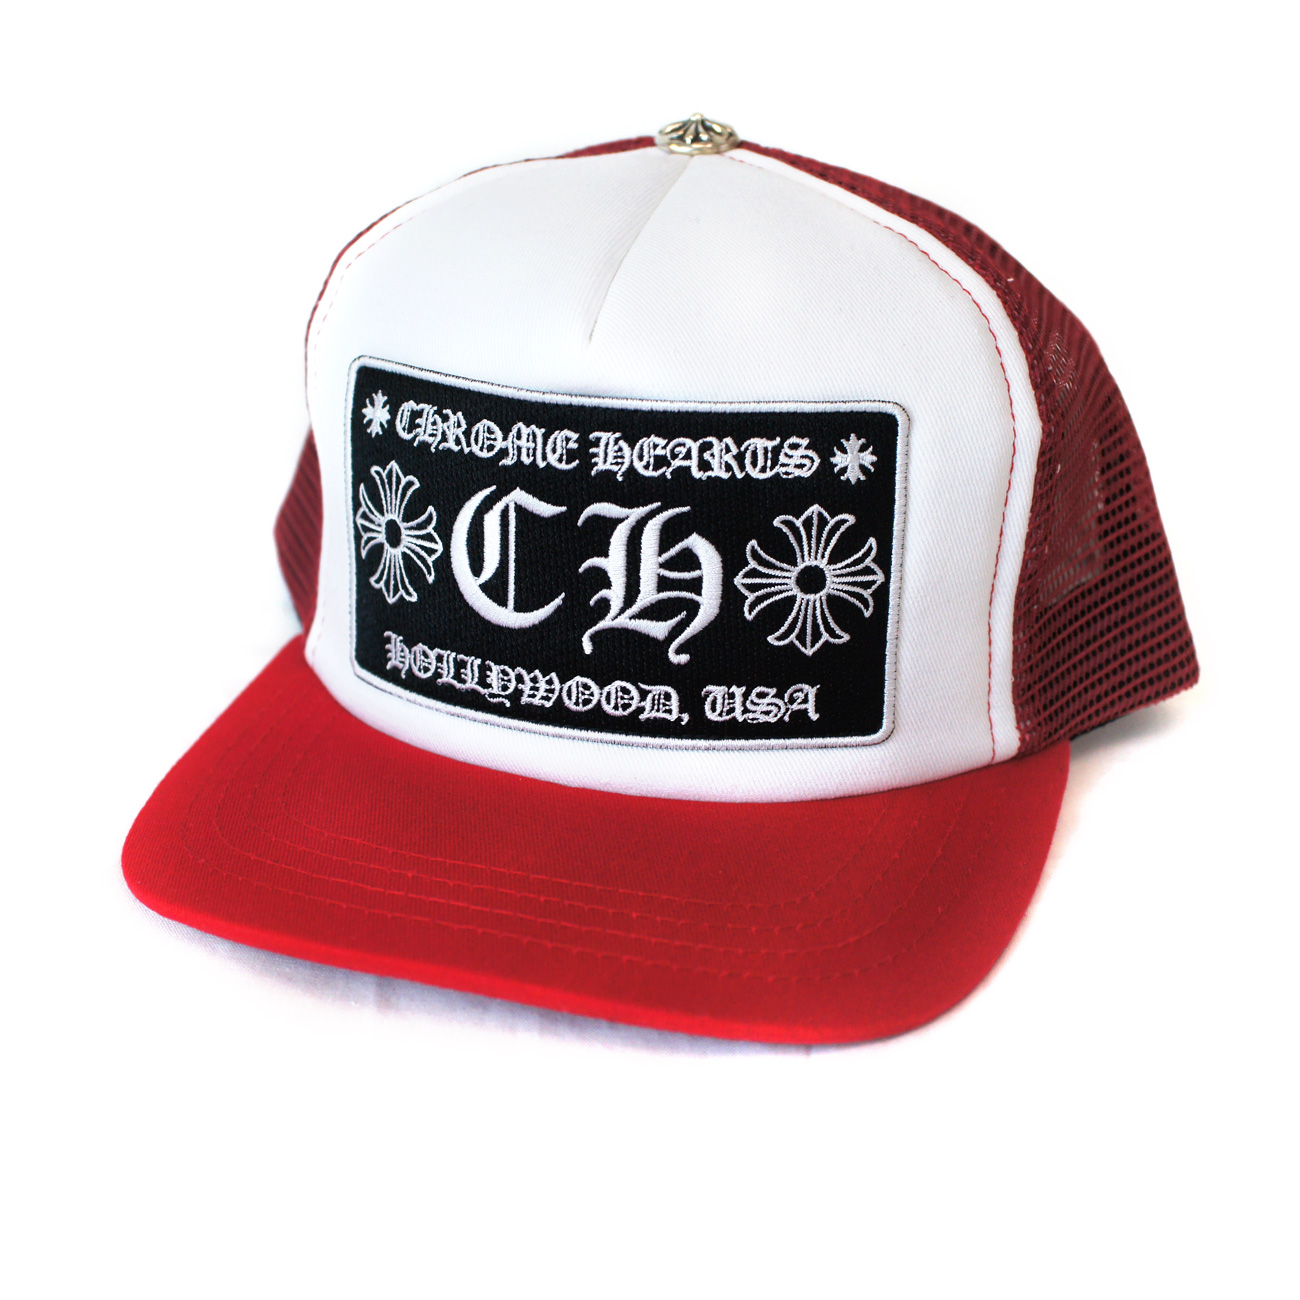 043a304e7de63 CHROME HEARTS CH HOLLYWOOD trucker cap Red